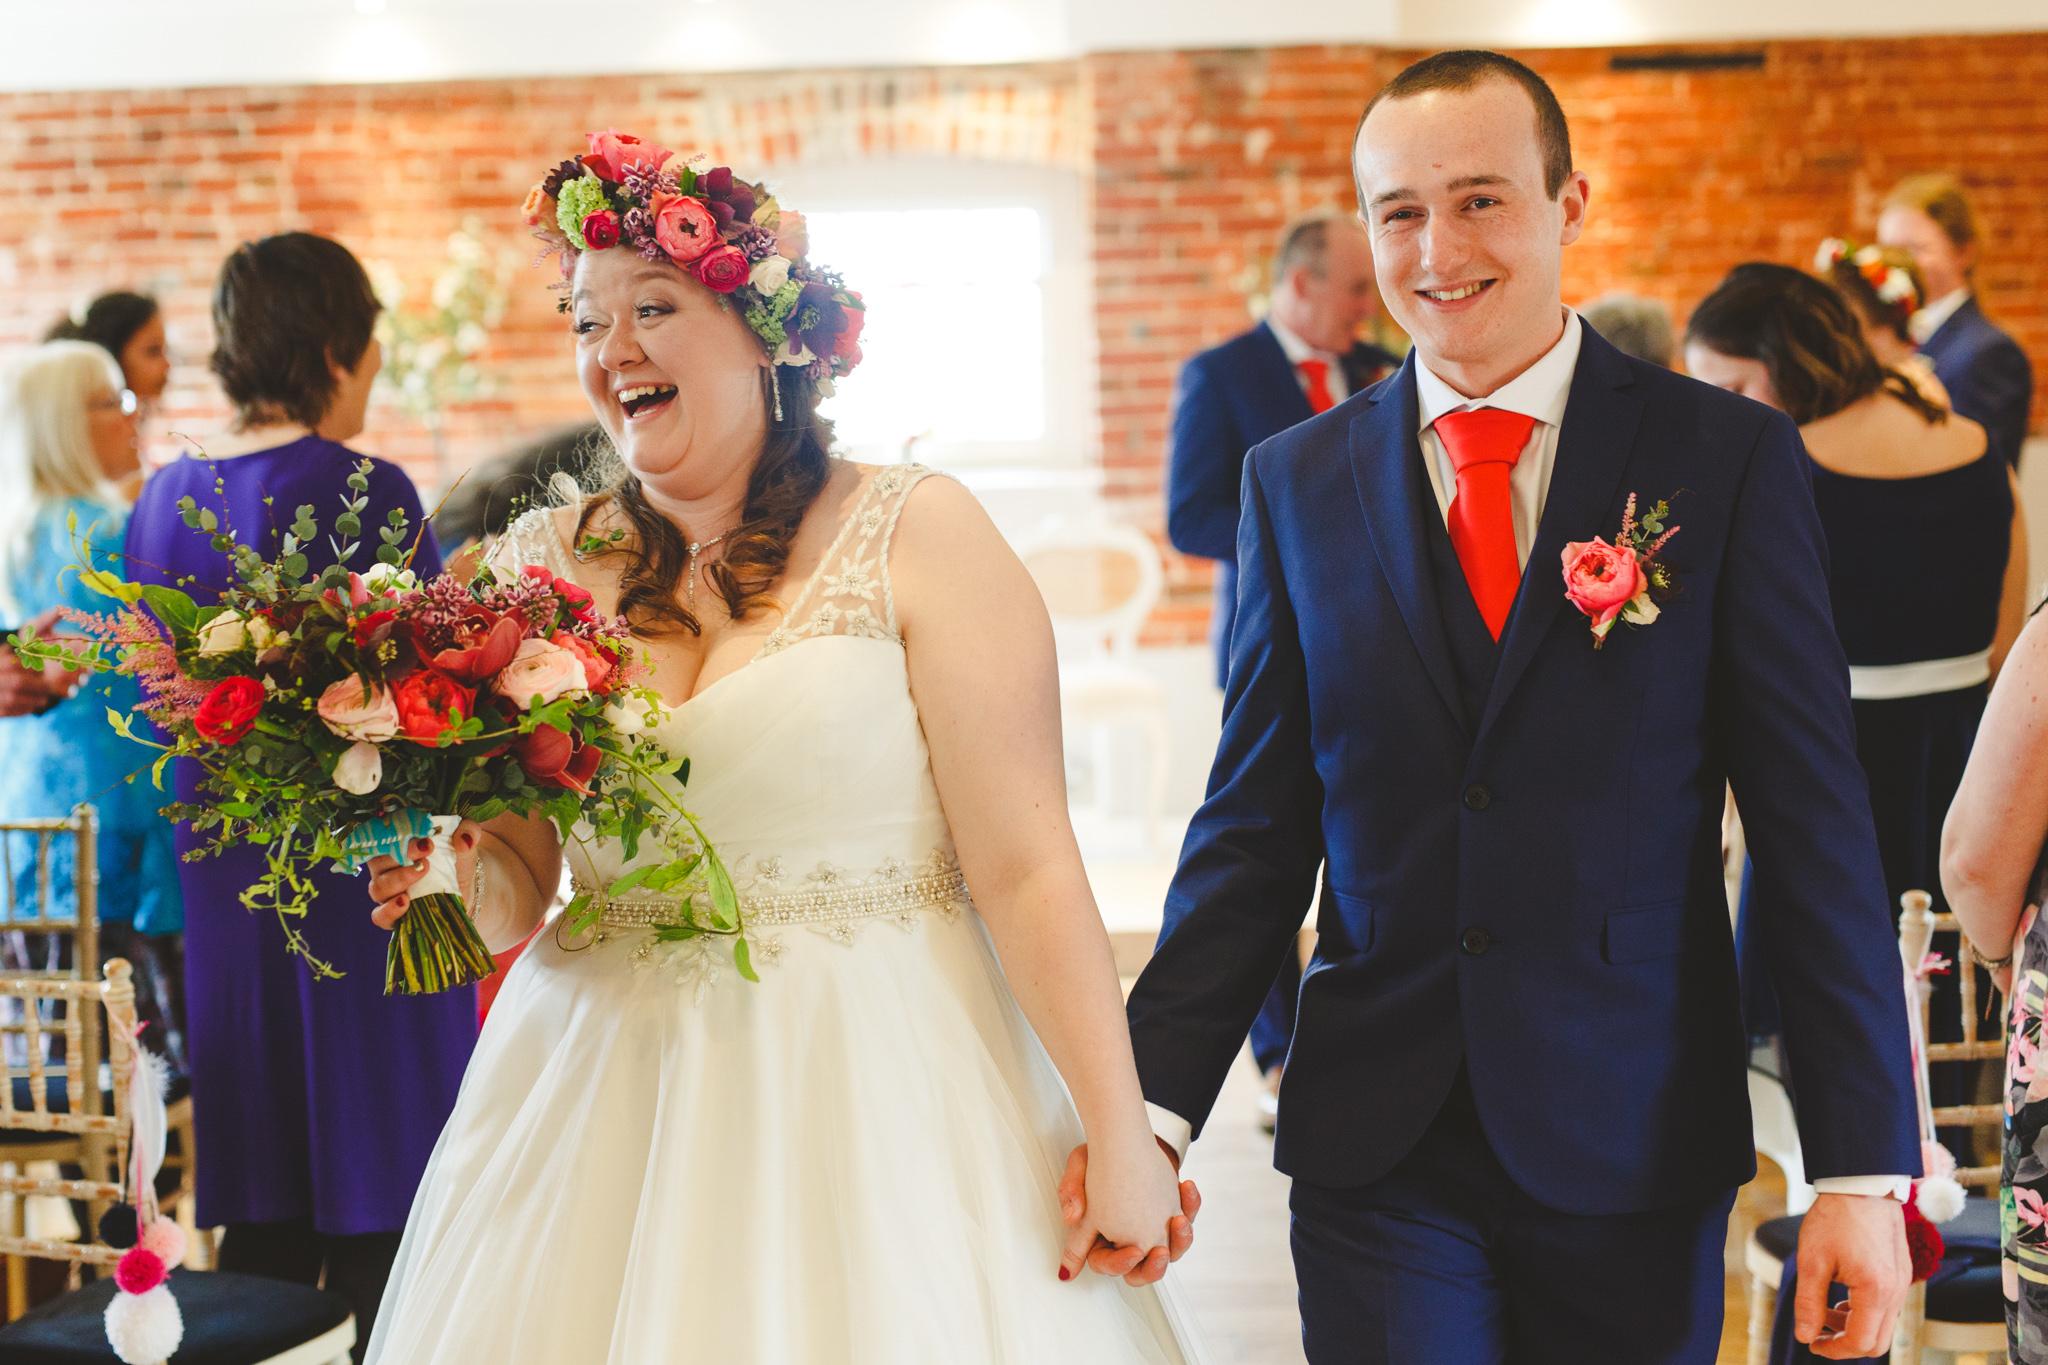 derbyshire-wedding-photographer-march-april-4.jpg